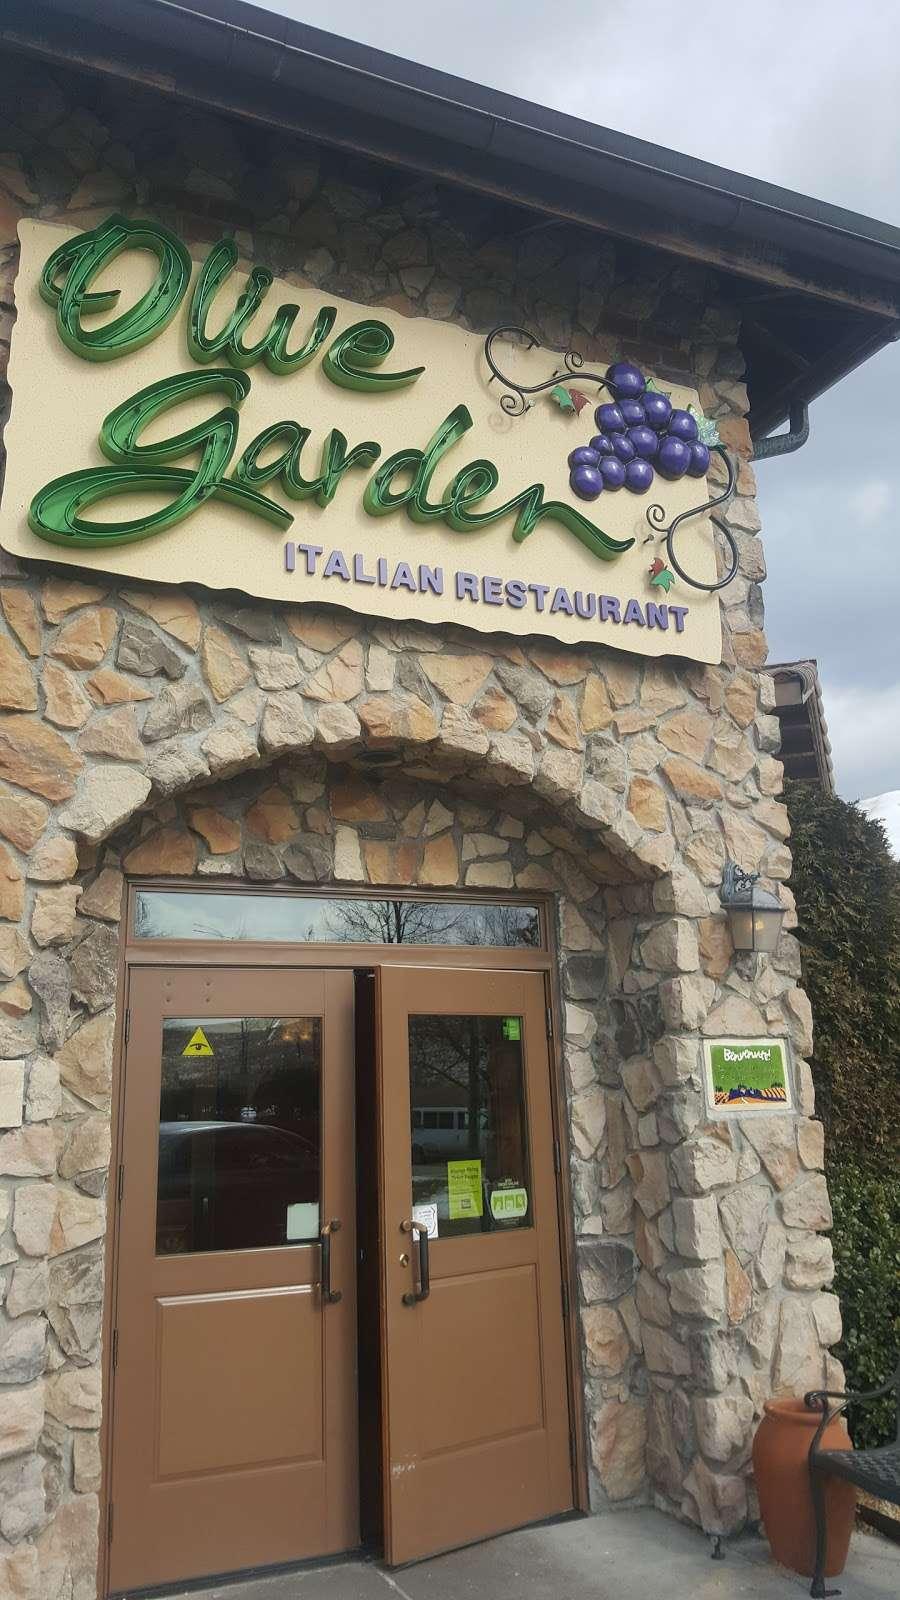 Olive Garden Italian Restaurant - meal takeaway  | Photo 3 of 10 | Address: 505 Gateway Dr, Brooklyn, NY 11239, USA | Phone: (718) 348-1071